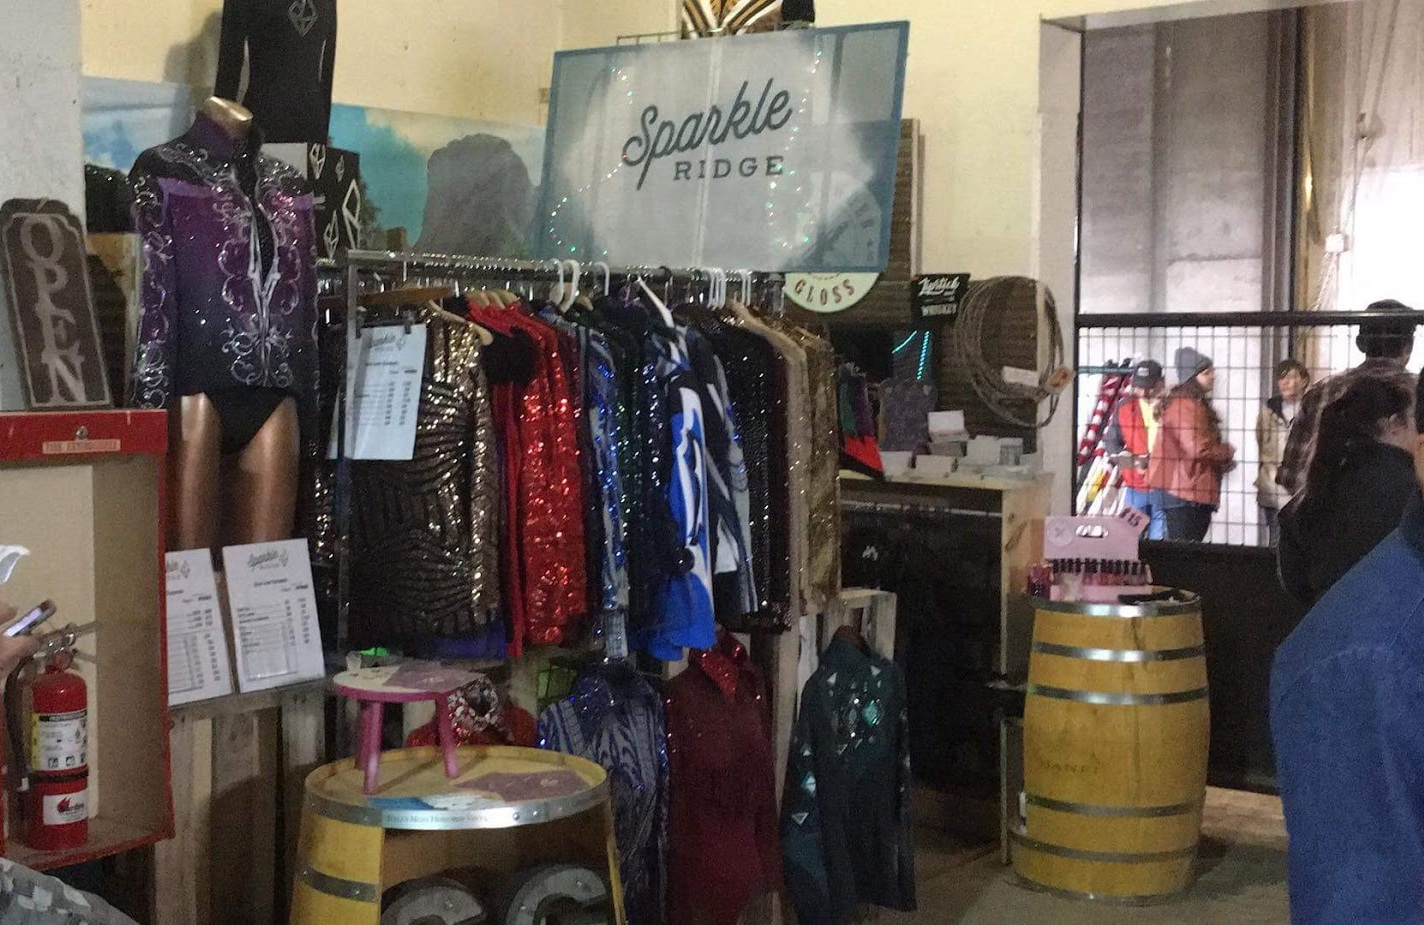 sparkle-ridge-western-show-clothes-tanbark-cavalcade-of-roses-sparkle-ridge-western-show-cothes-booth.JPG